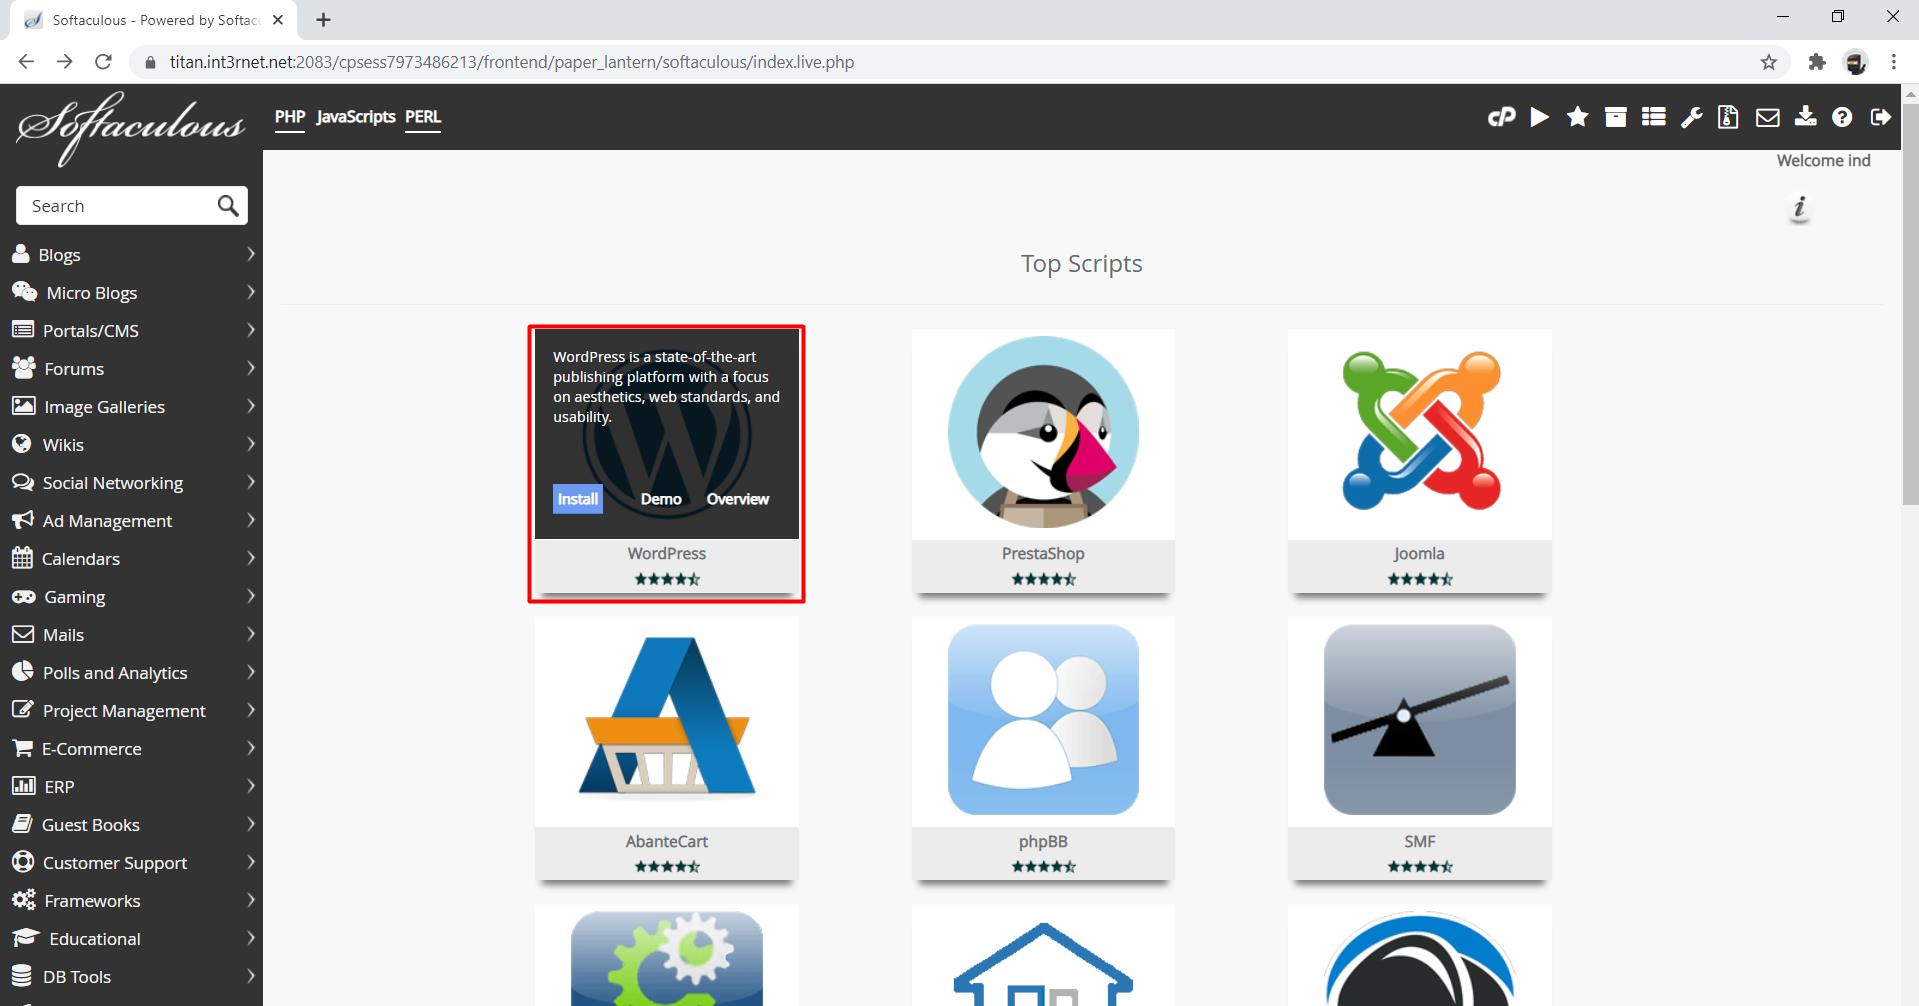 Softaculous-Click-WordPress-Install